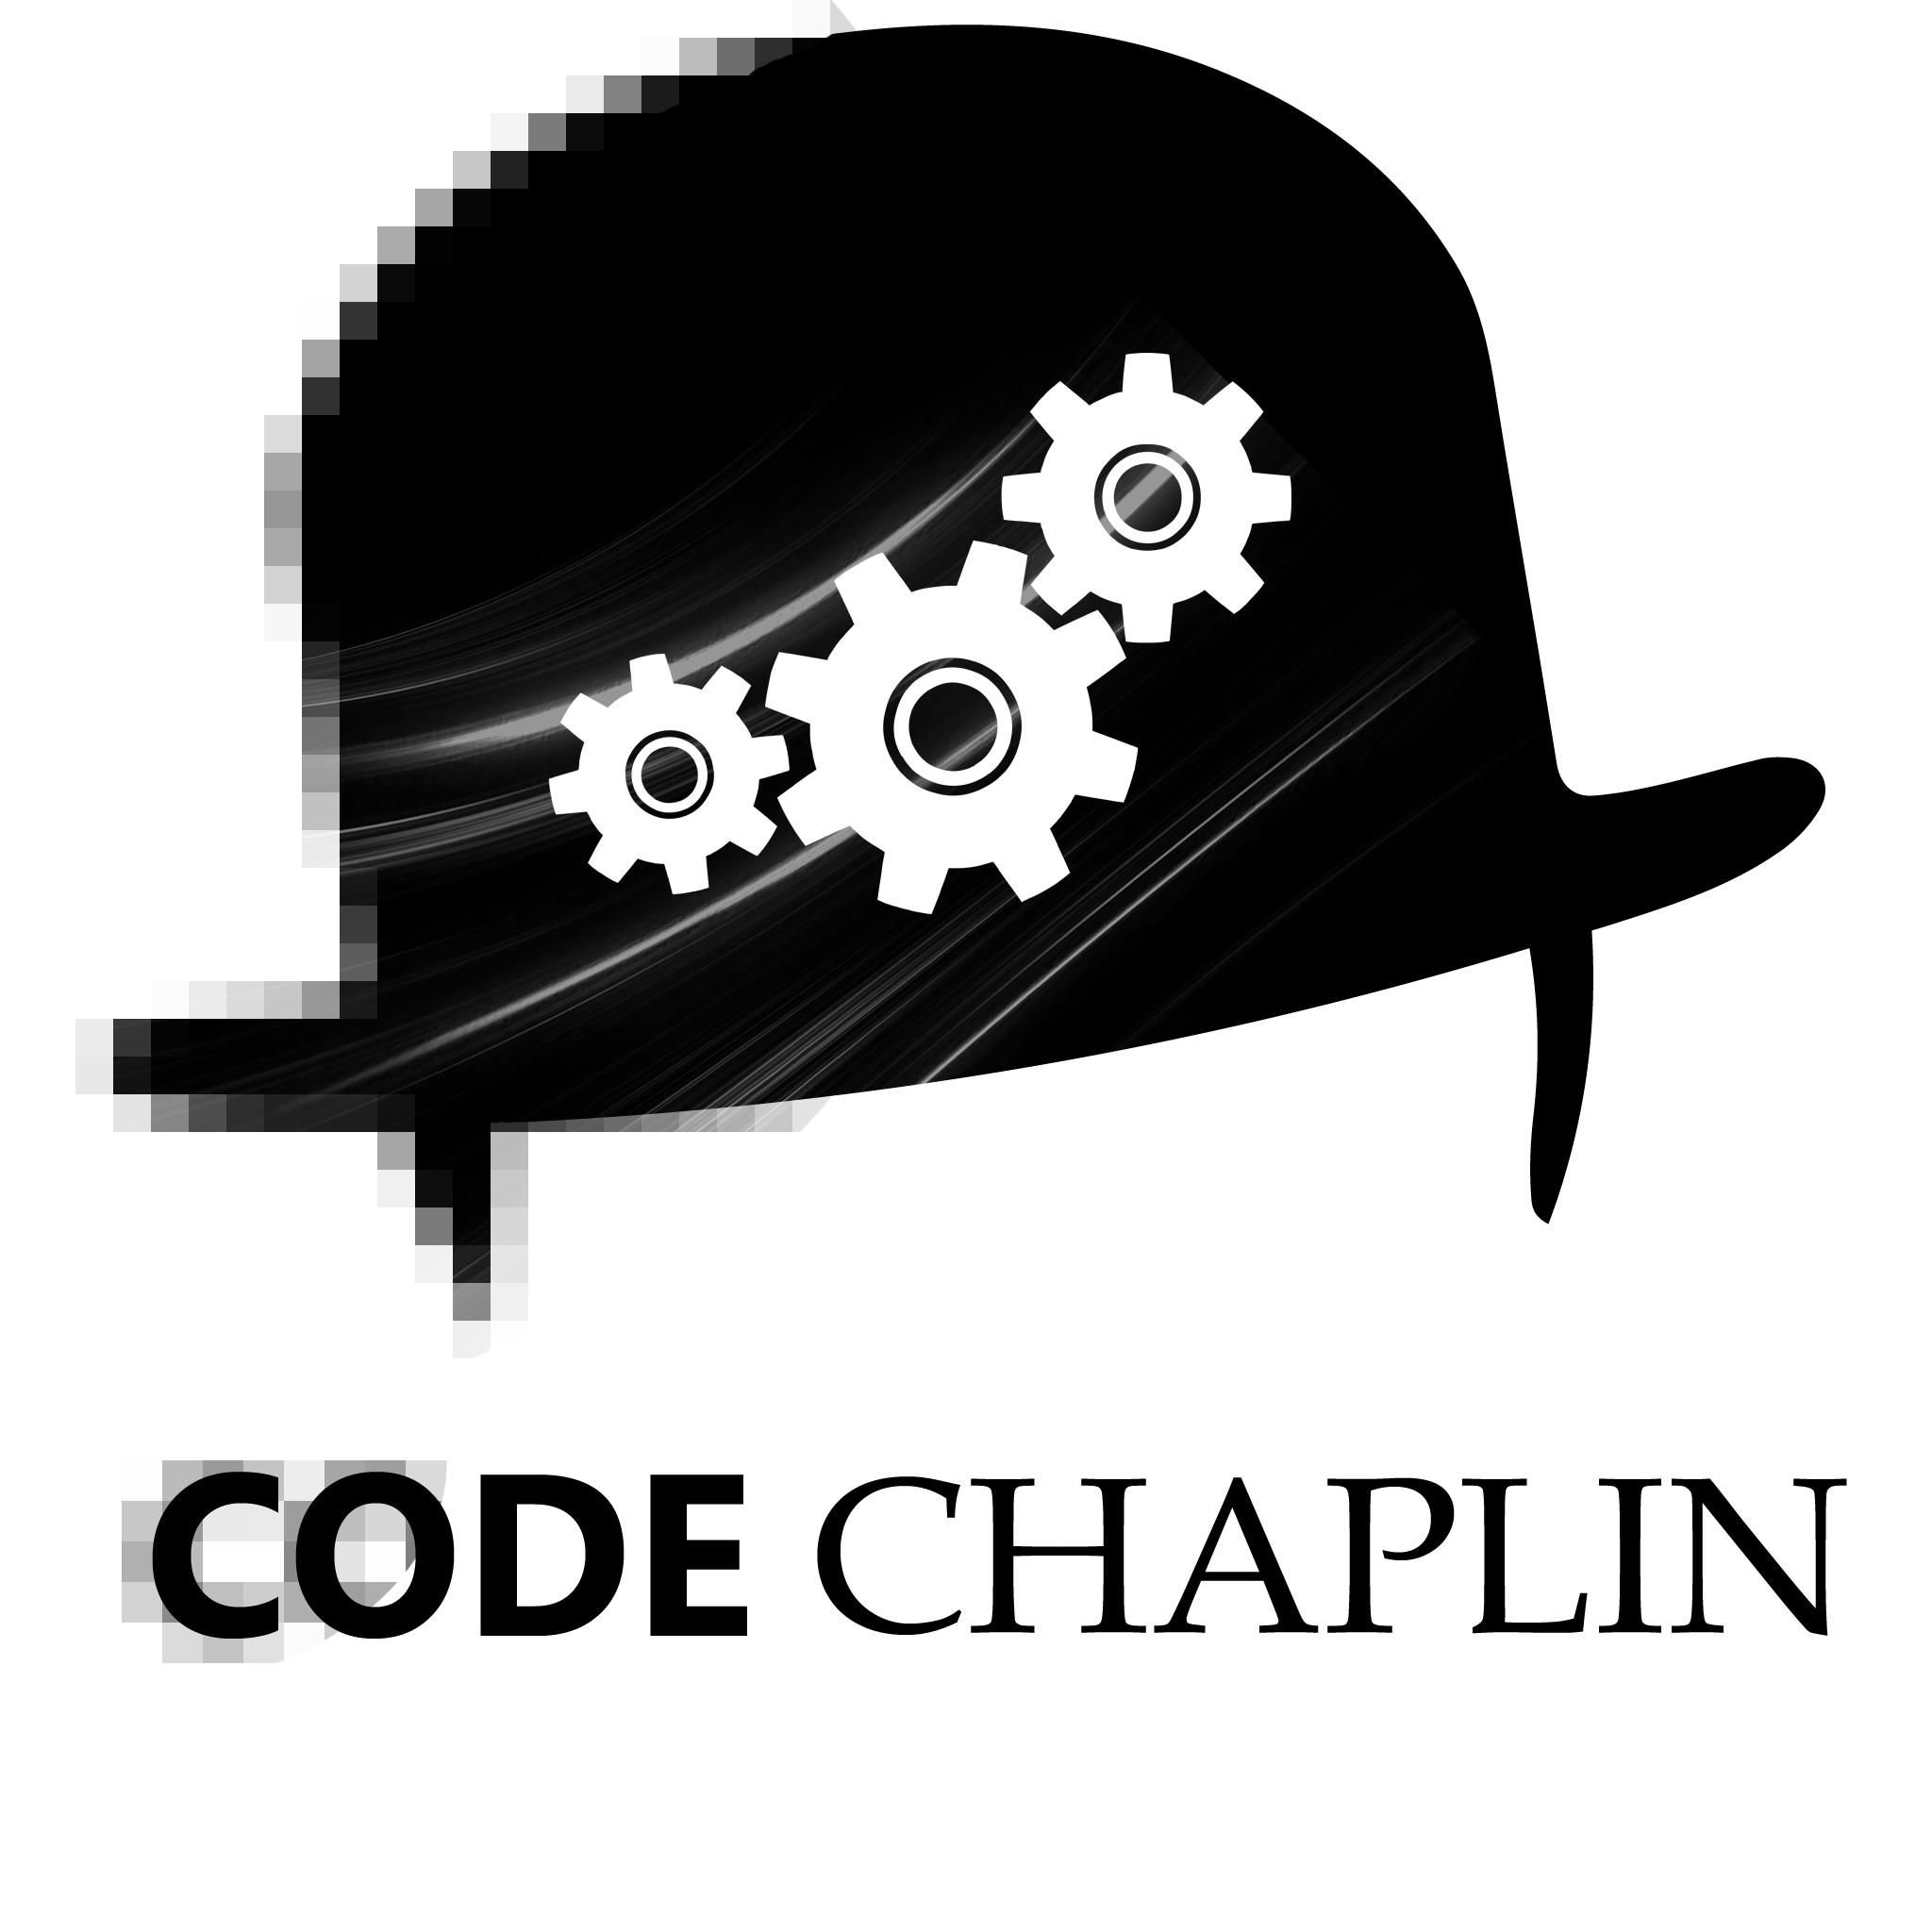 Codechaplin noir